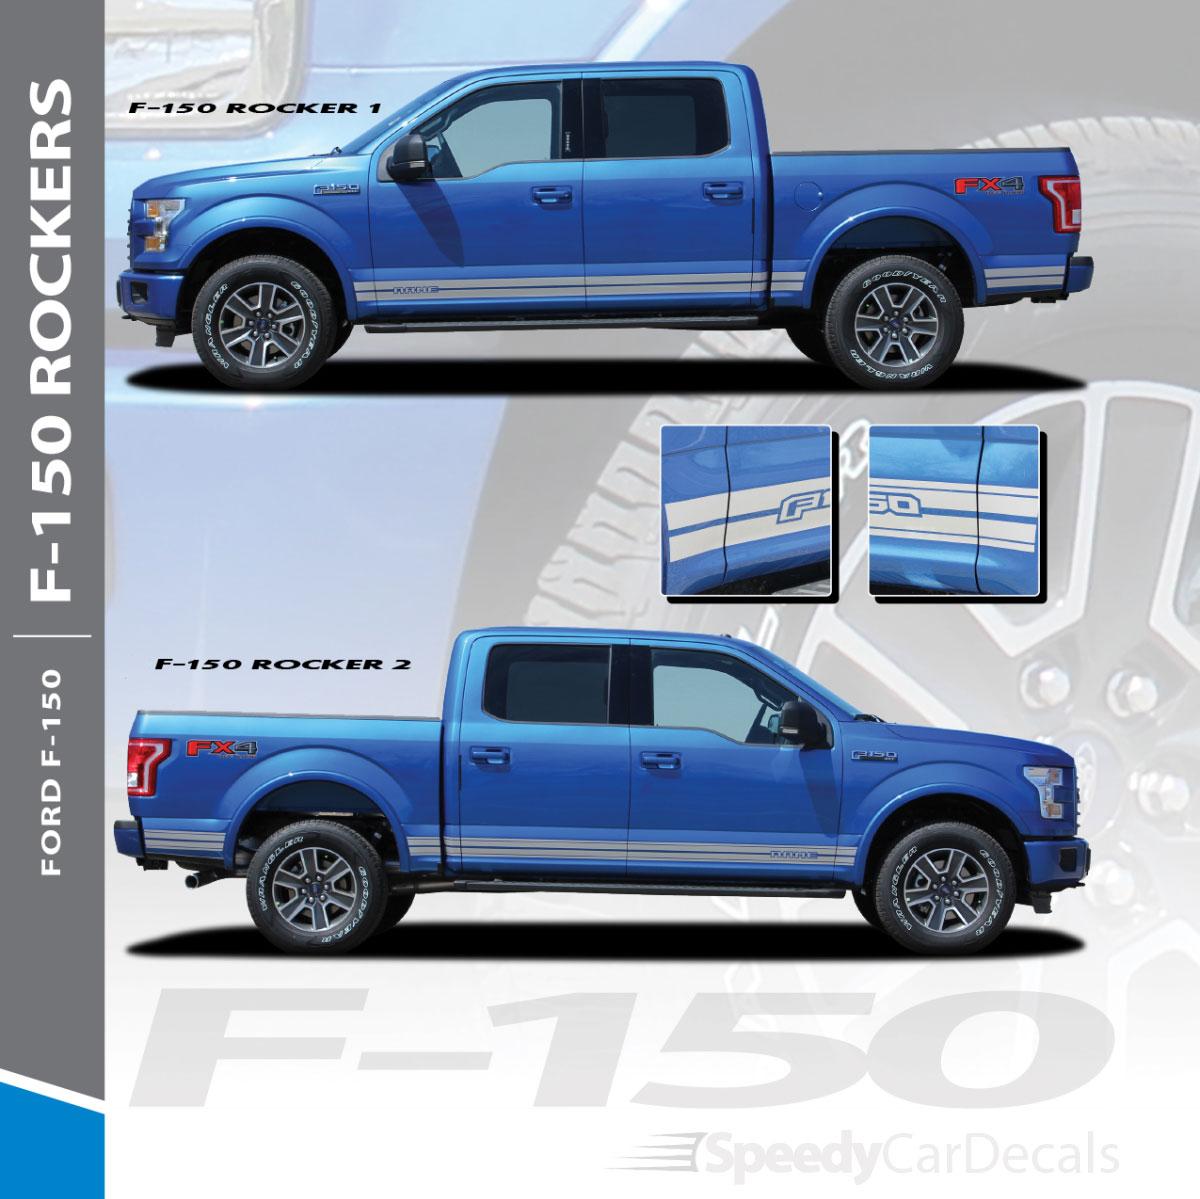 Ford F150 Decals 15 150 Rocker 1 2015 2016 2017 2018 2019